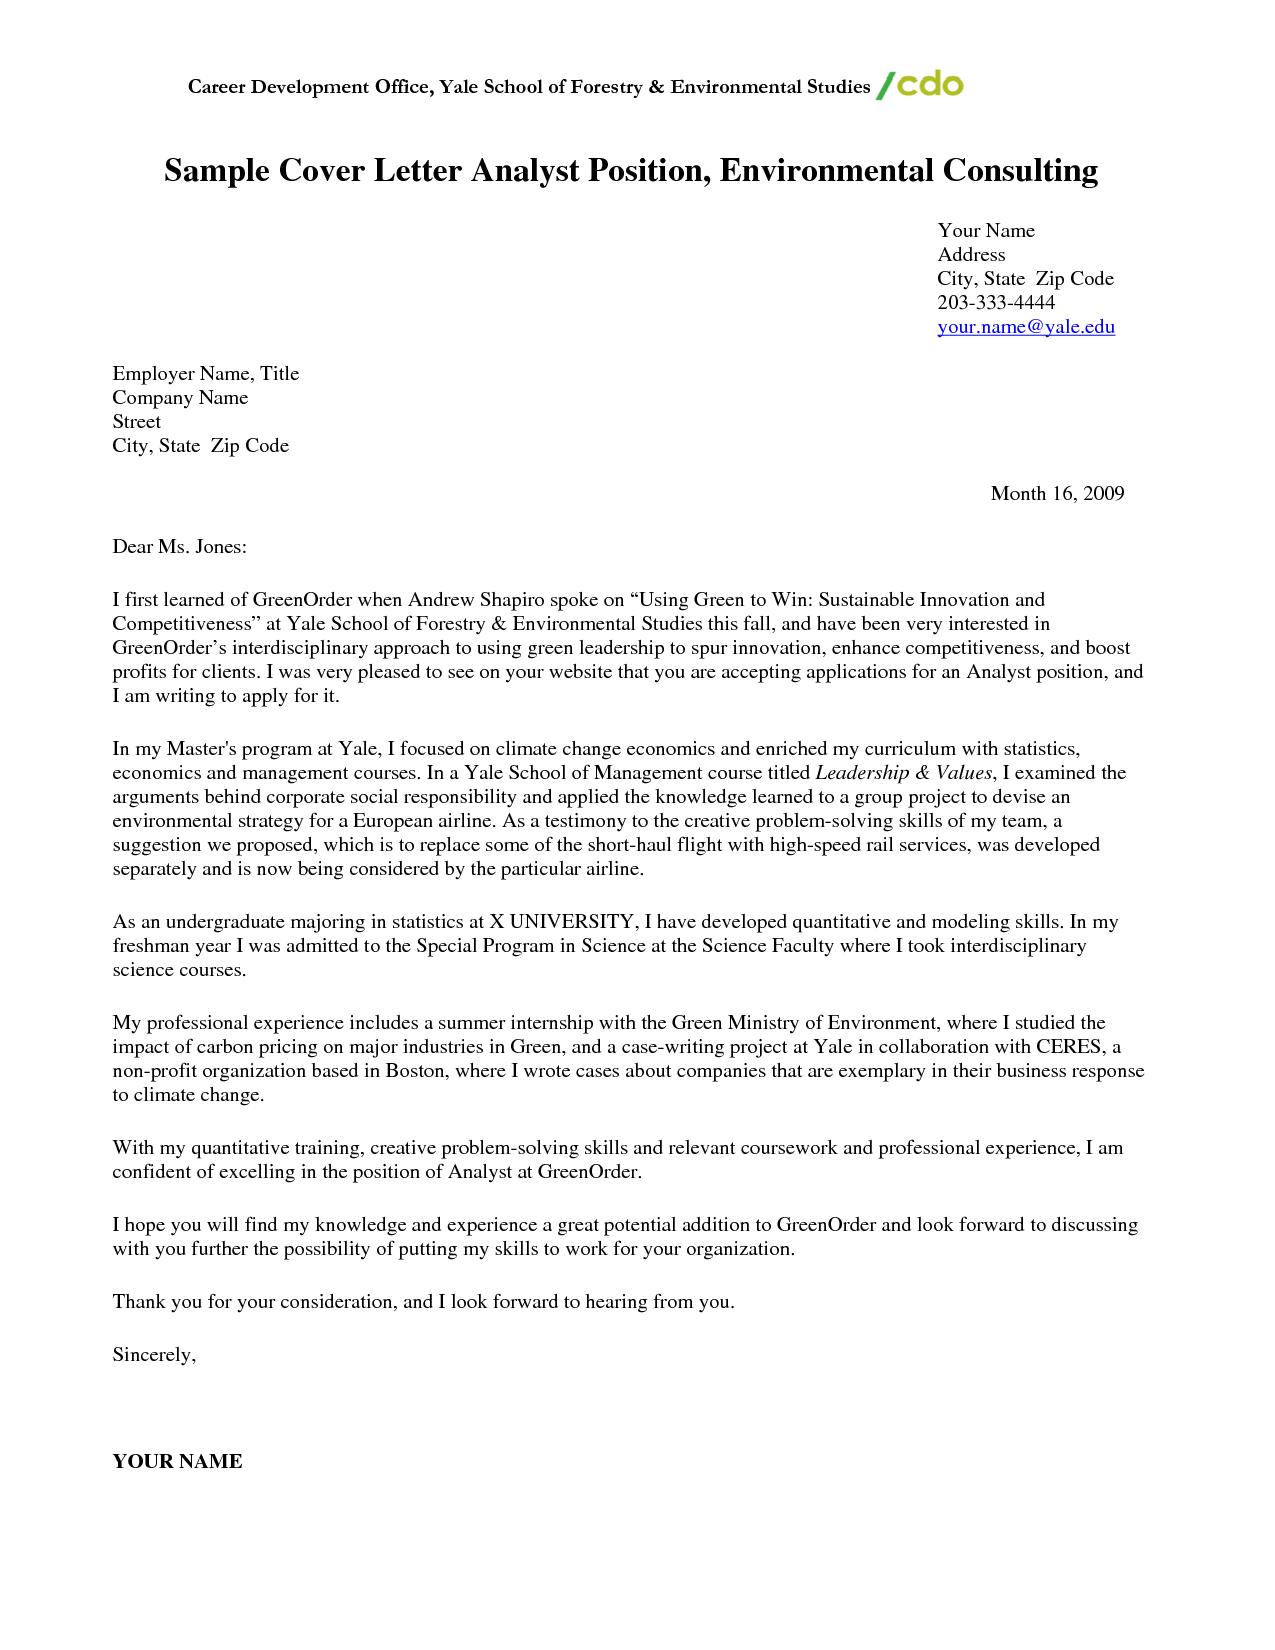 Customer Service Consultant Cover Letter